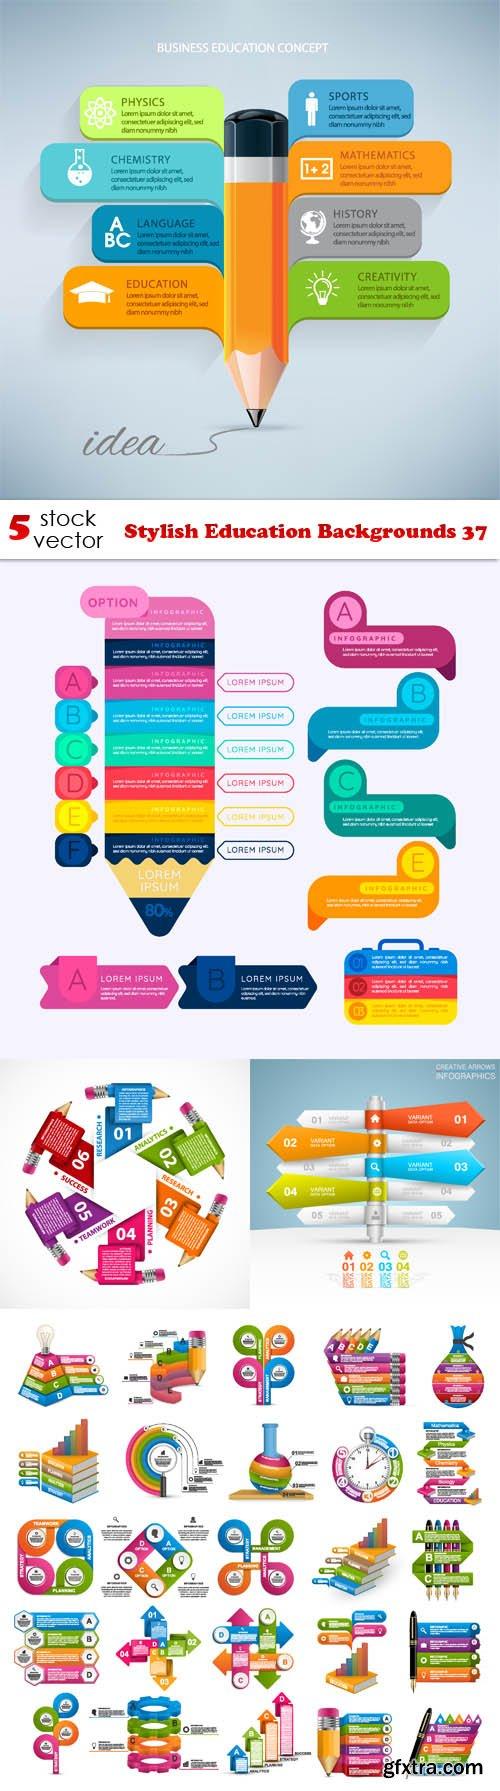 Vectors - Stylish Education Backgrounds 37